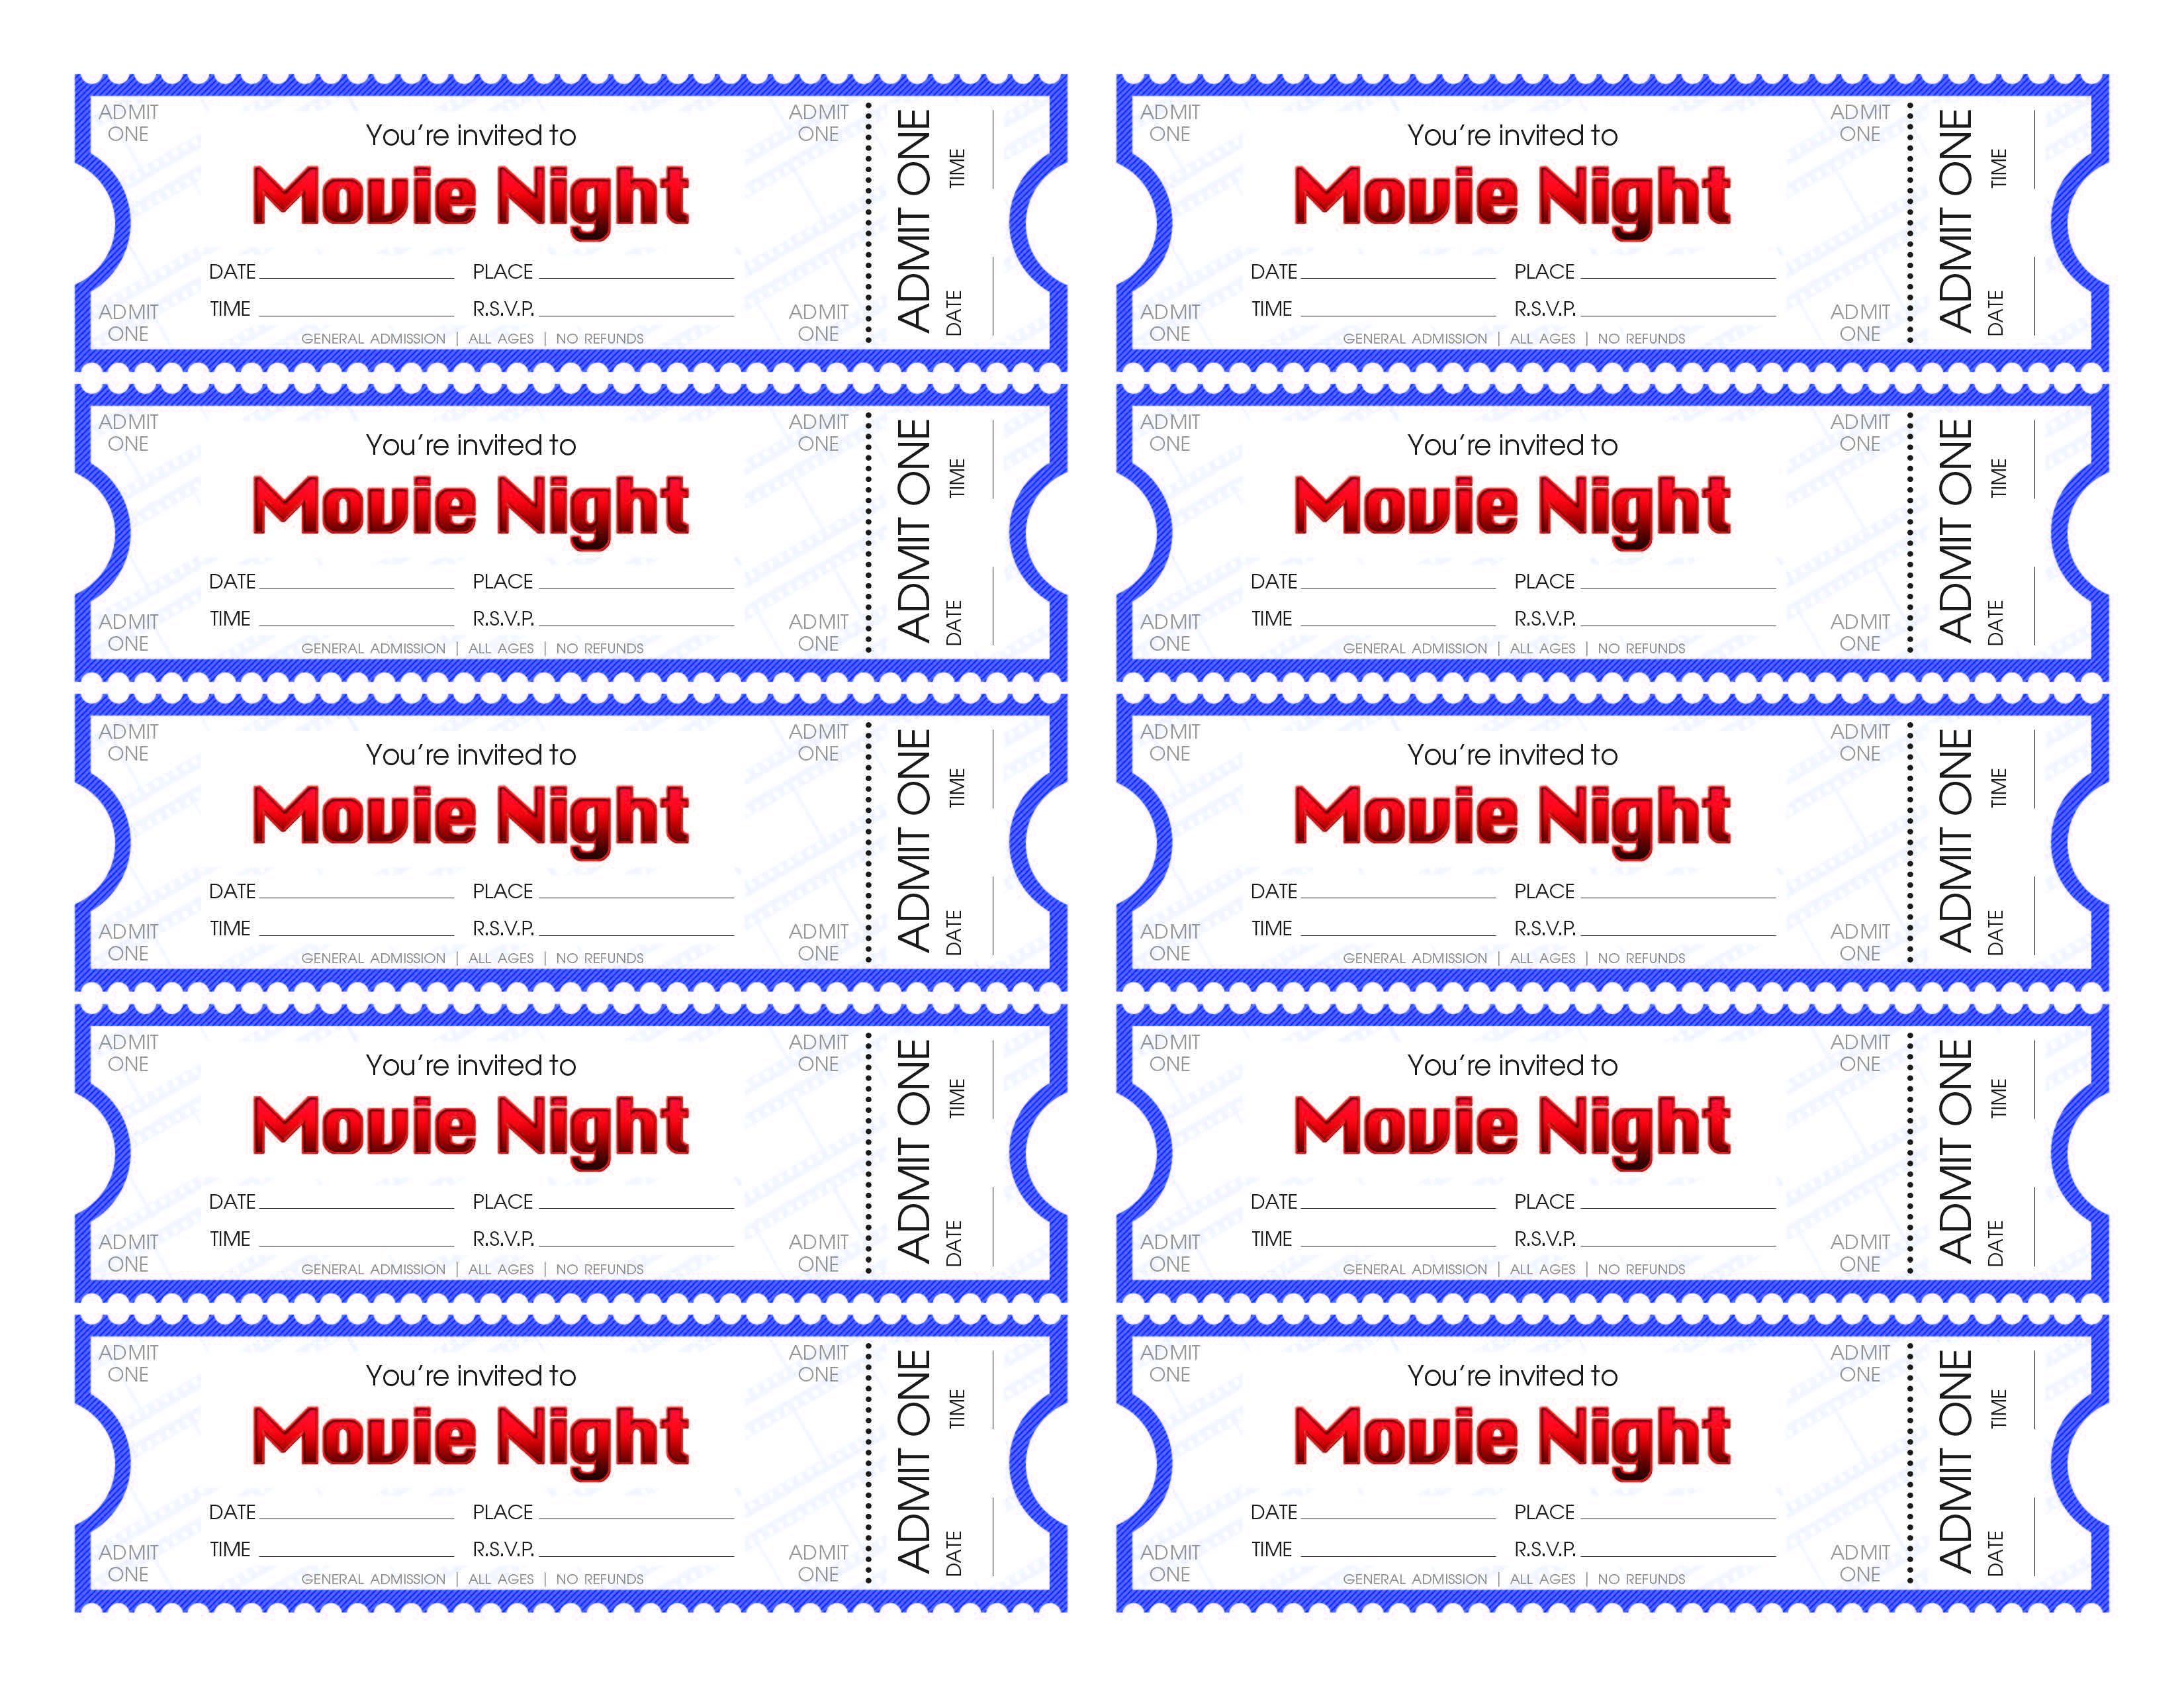 printable ticket template – Printable Movie Ticket Template